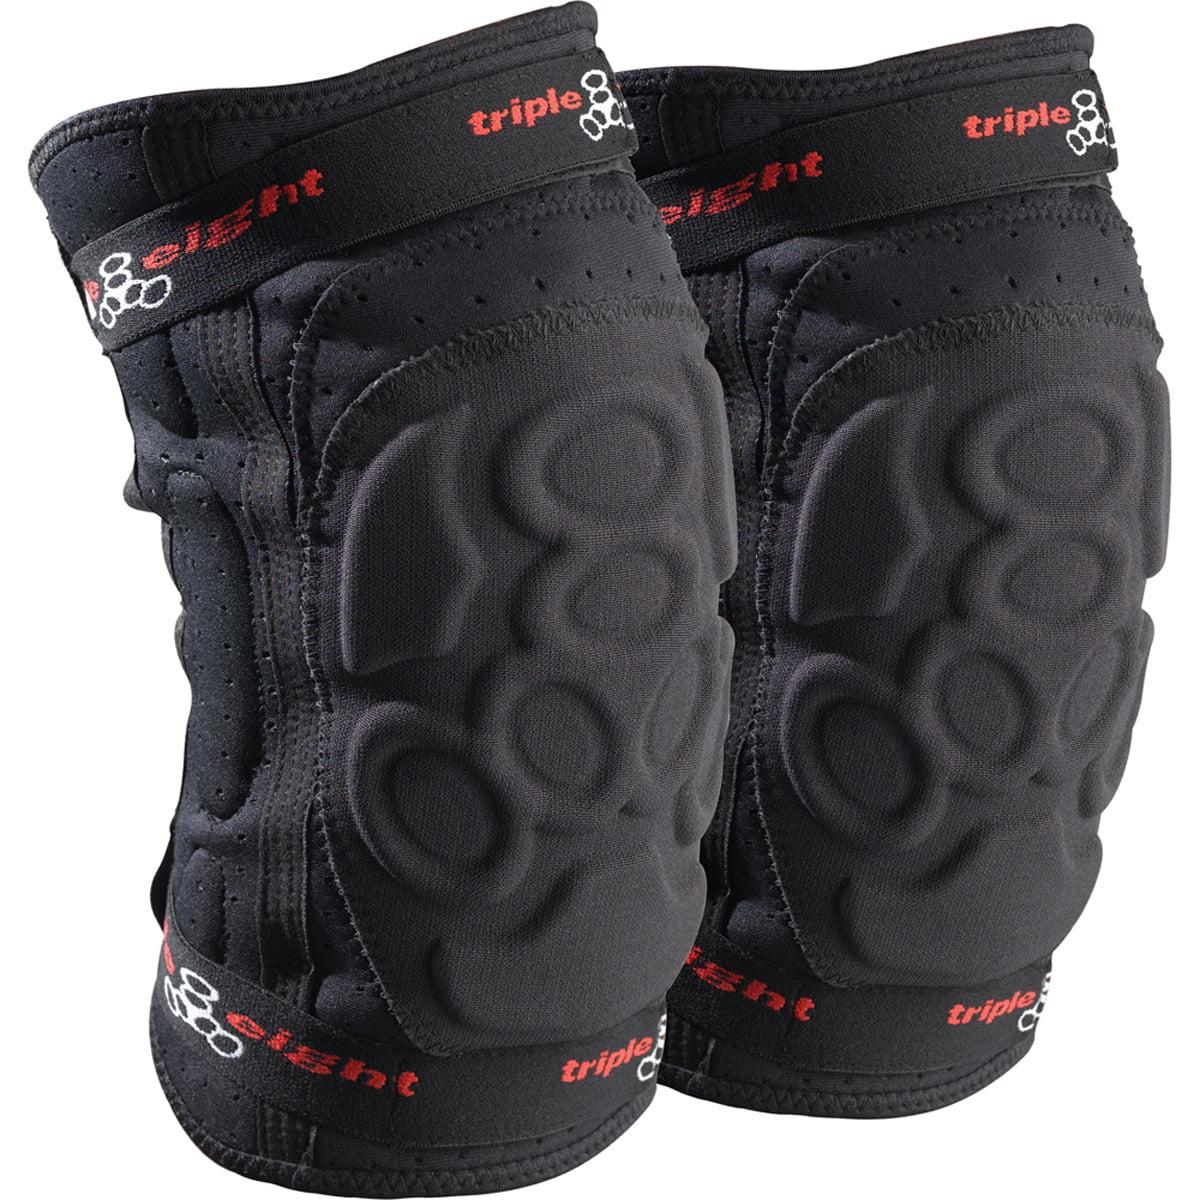 Triple8 Pad Set Exoskin Knee Sm